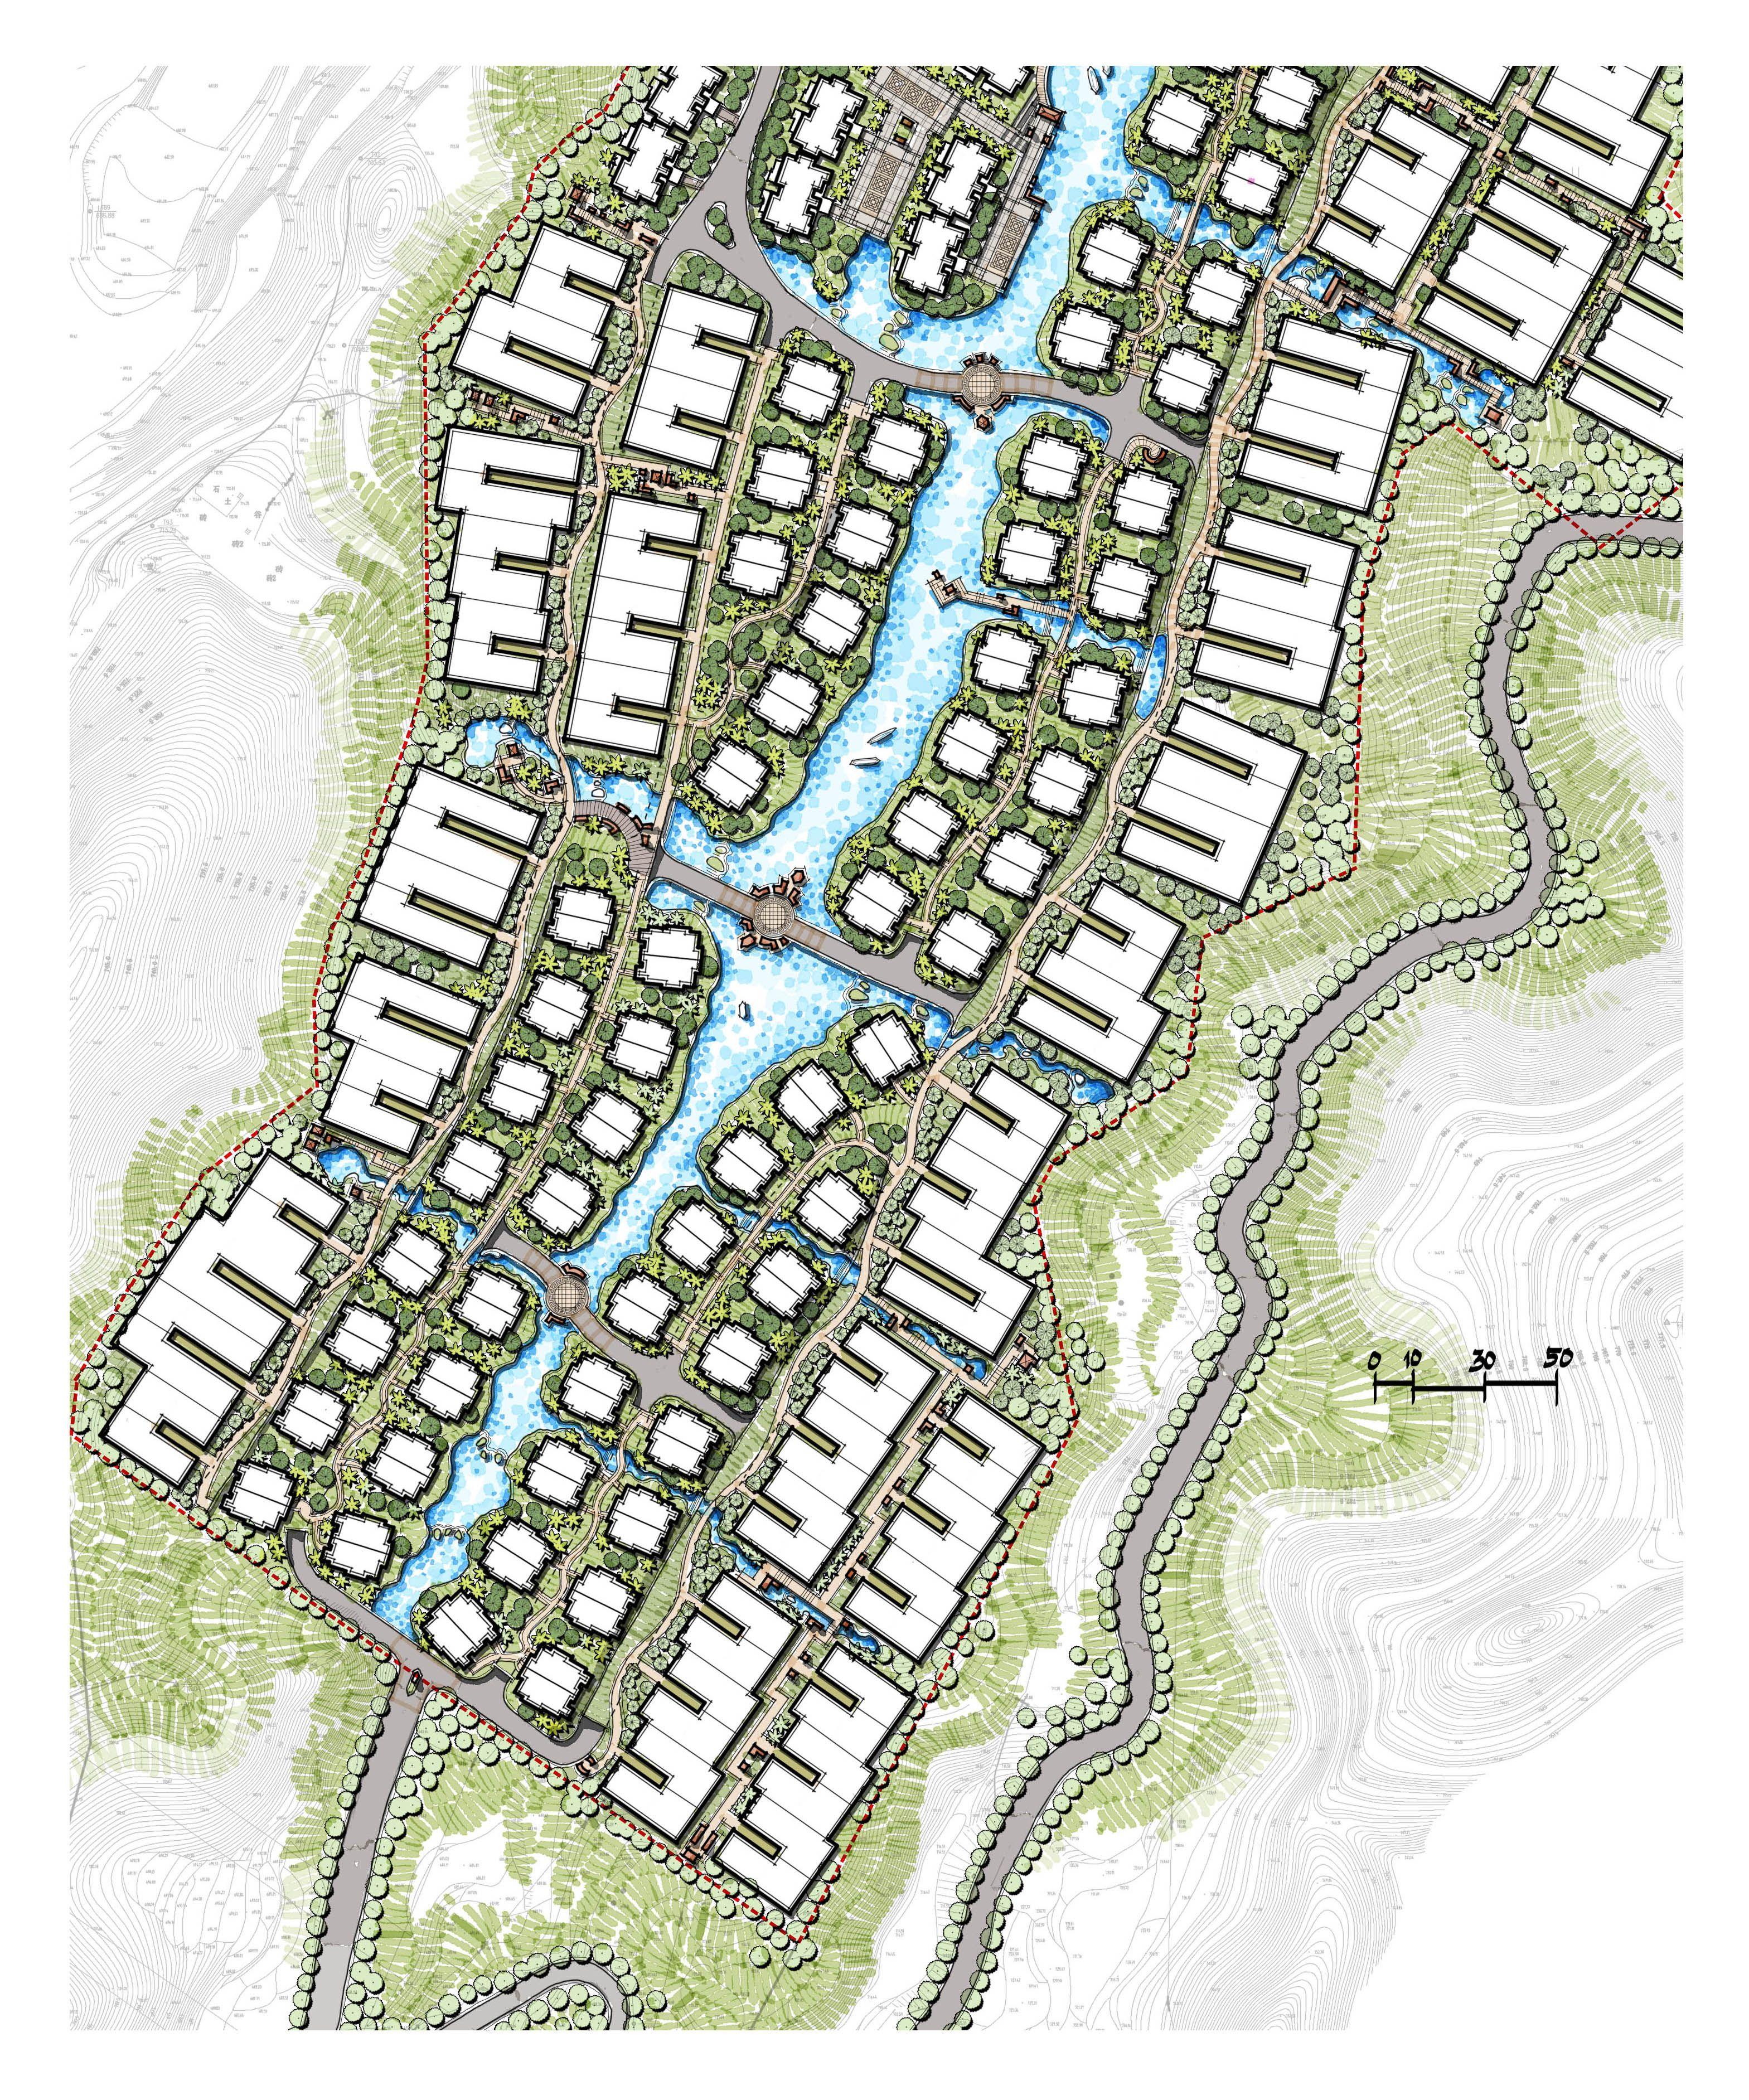 Mountain Development Mountain Villas 3 Days Work Master Plan Mountain Landscape Design Man Made River Casc Master Plan Concept Architecture Urban Planning